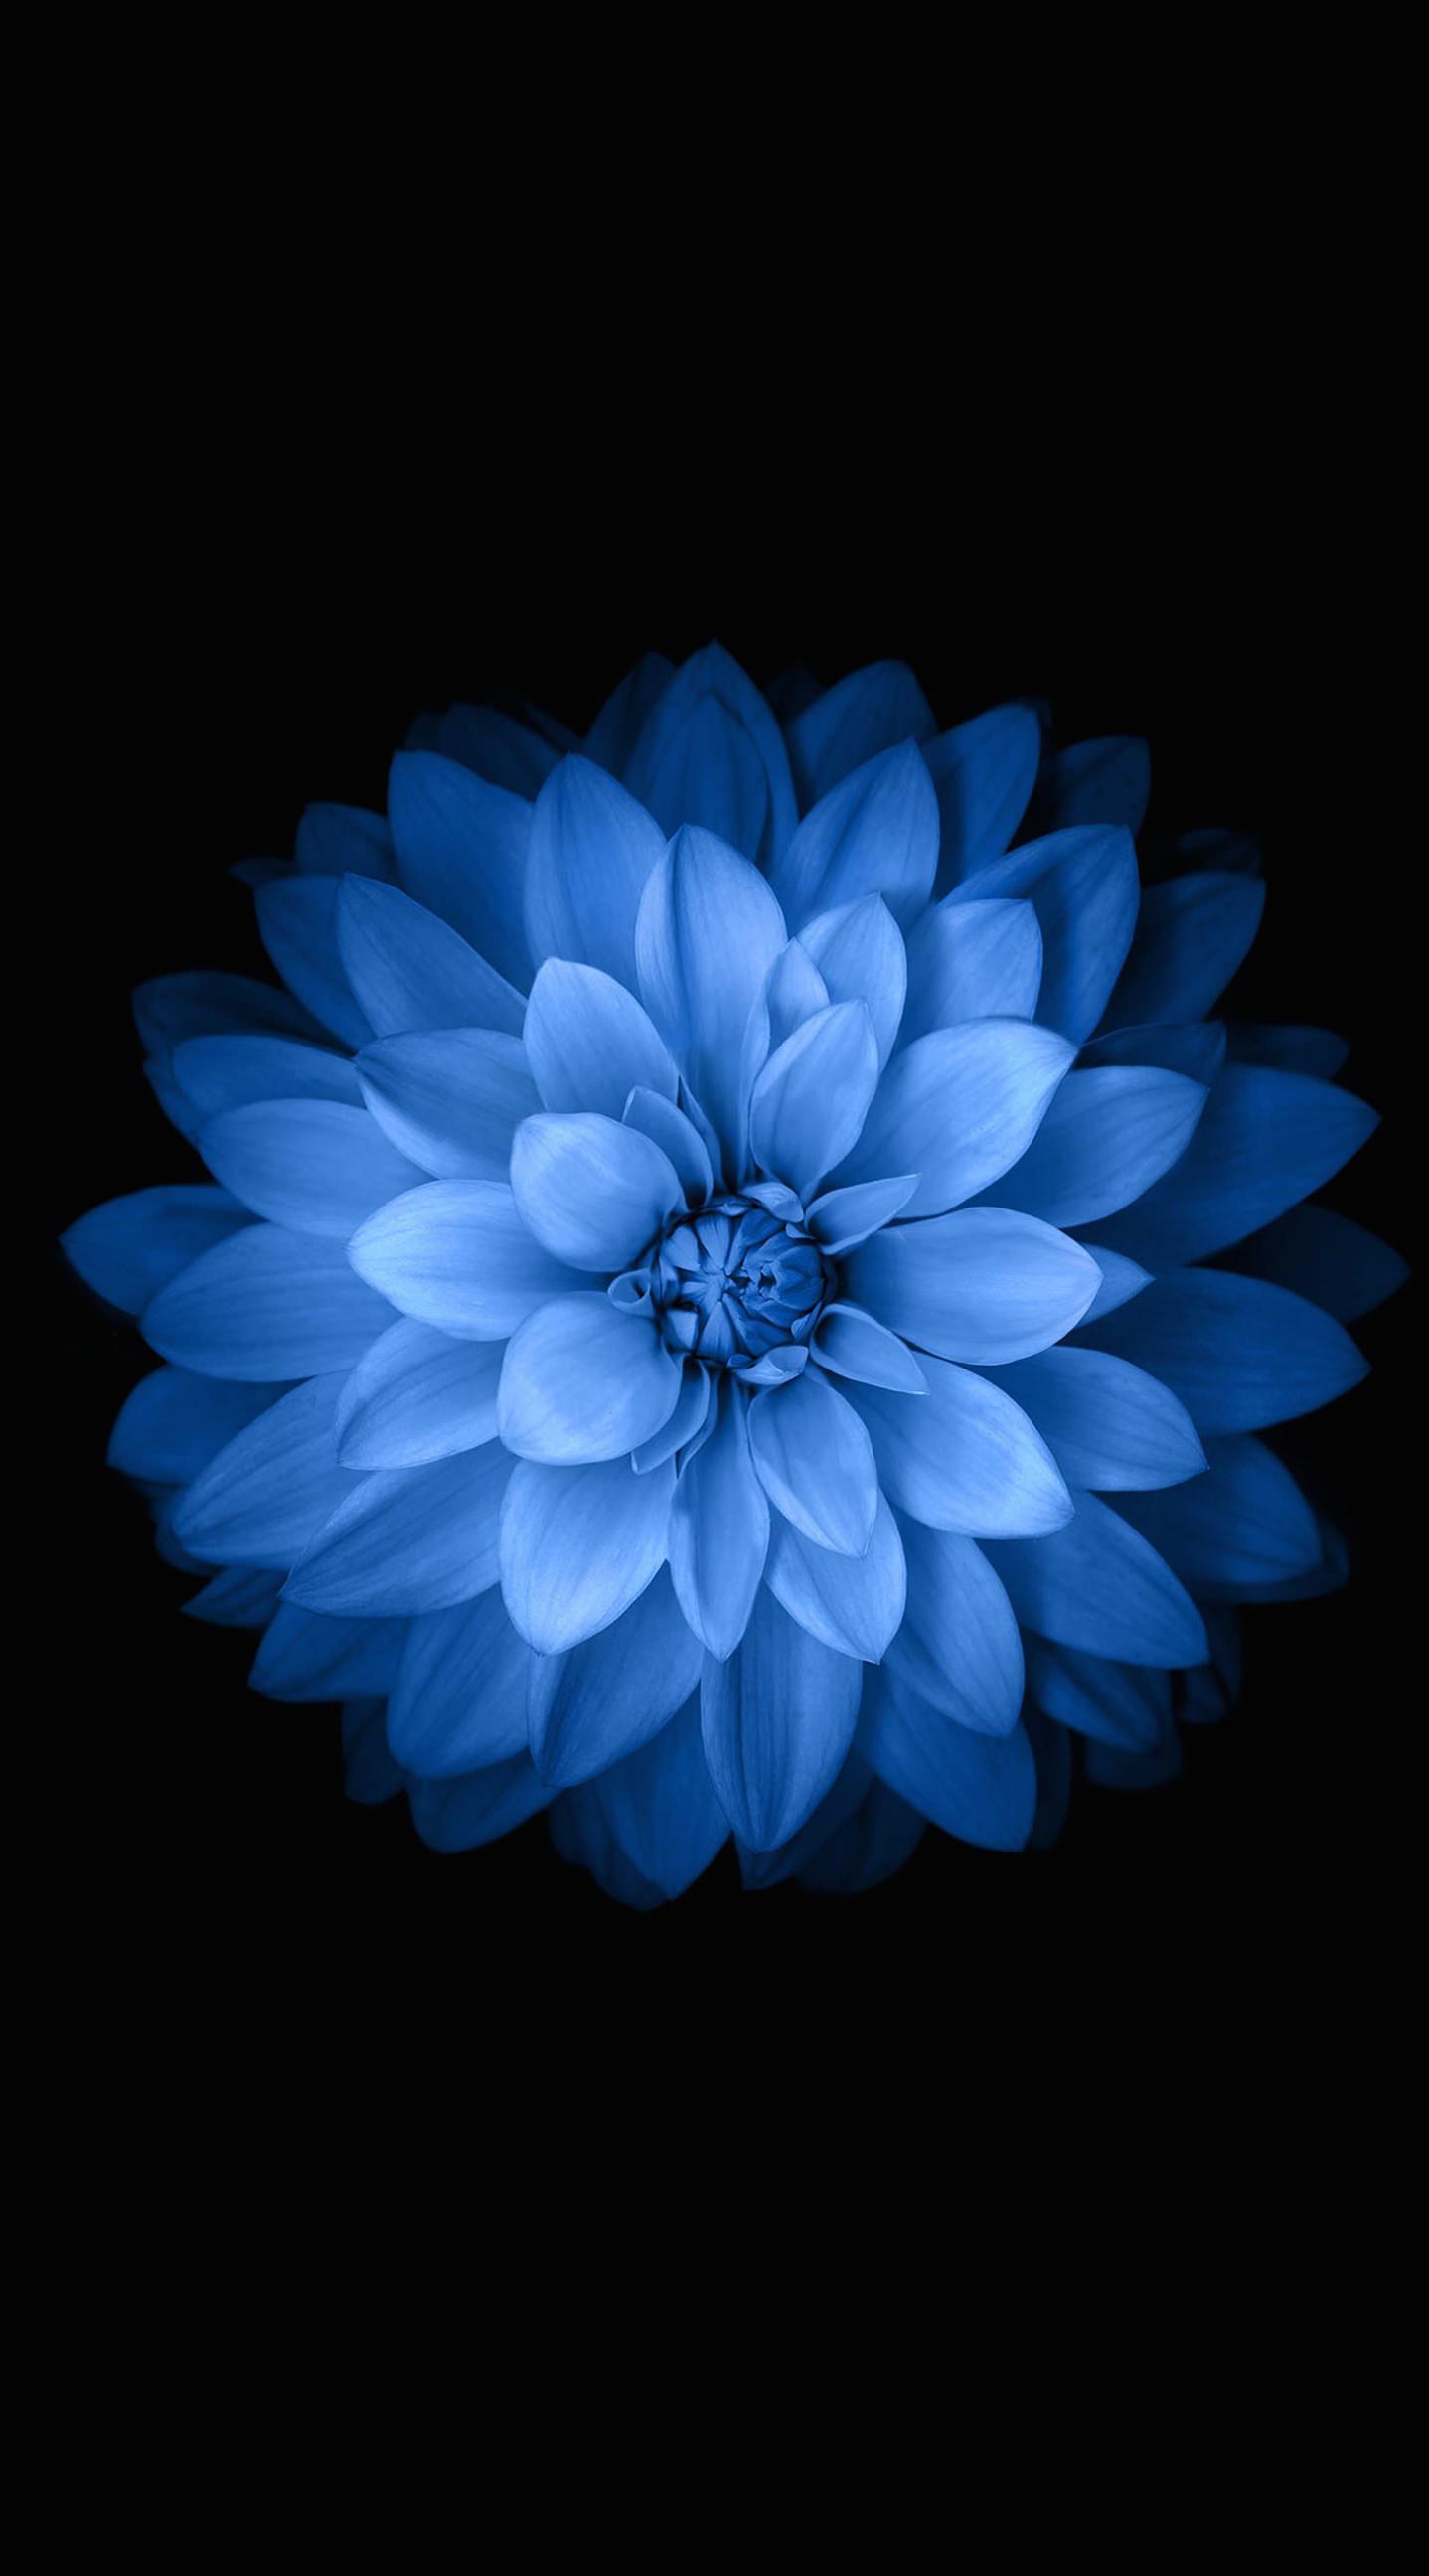 Blue black flower wallpapersc iPhone6Plus 1438x2592